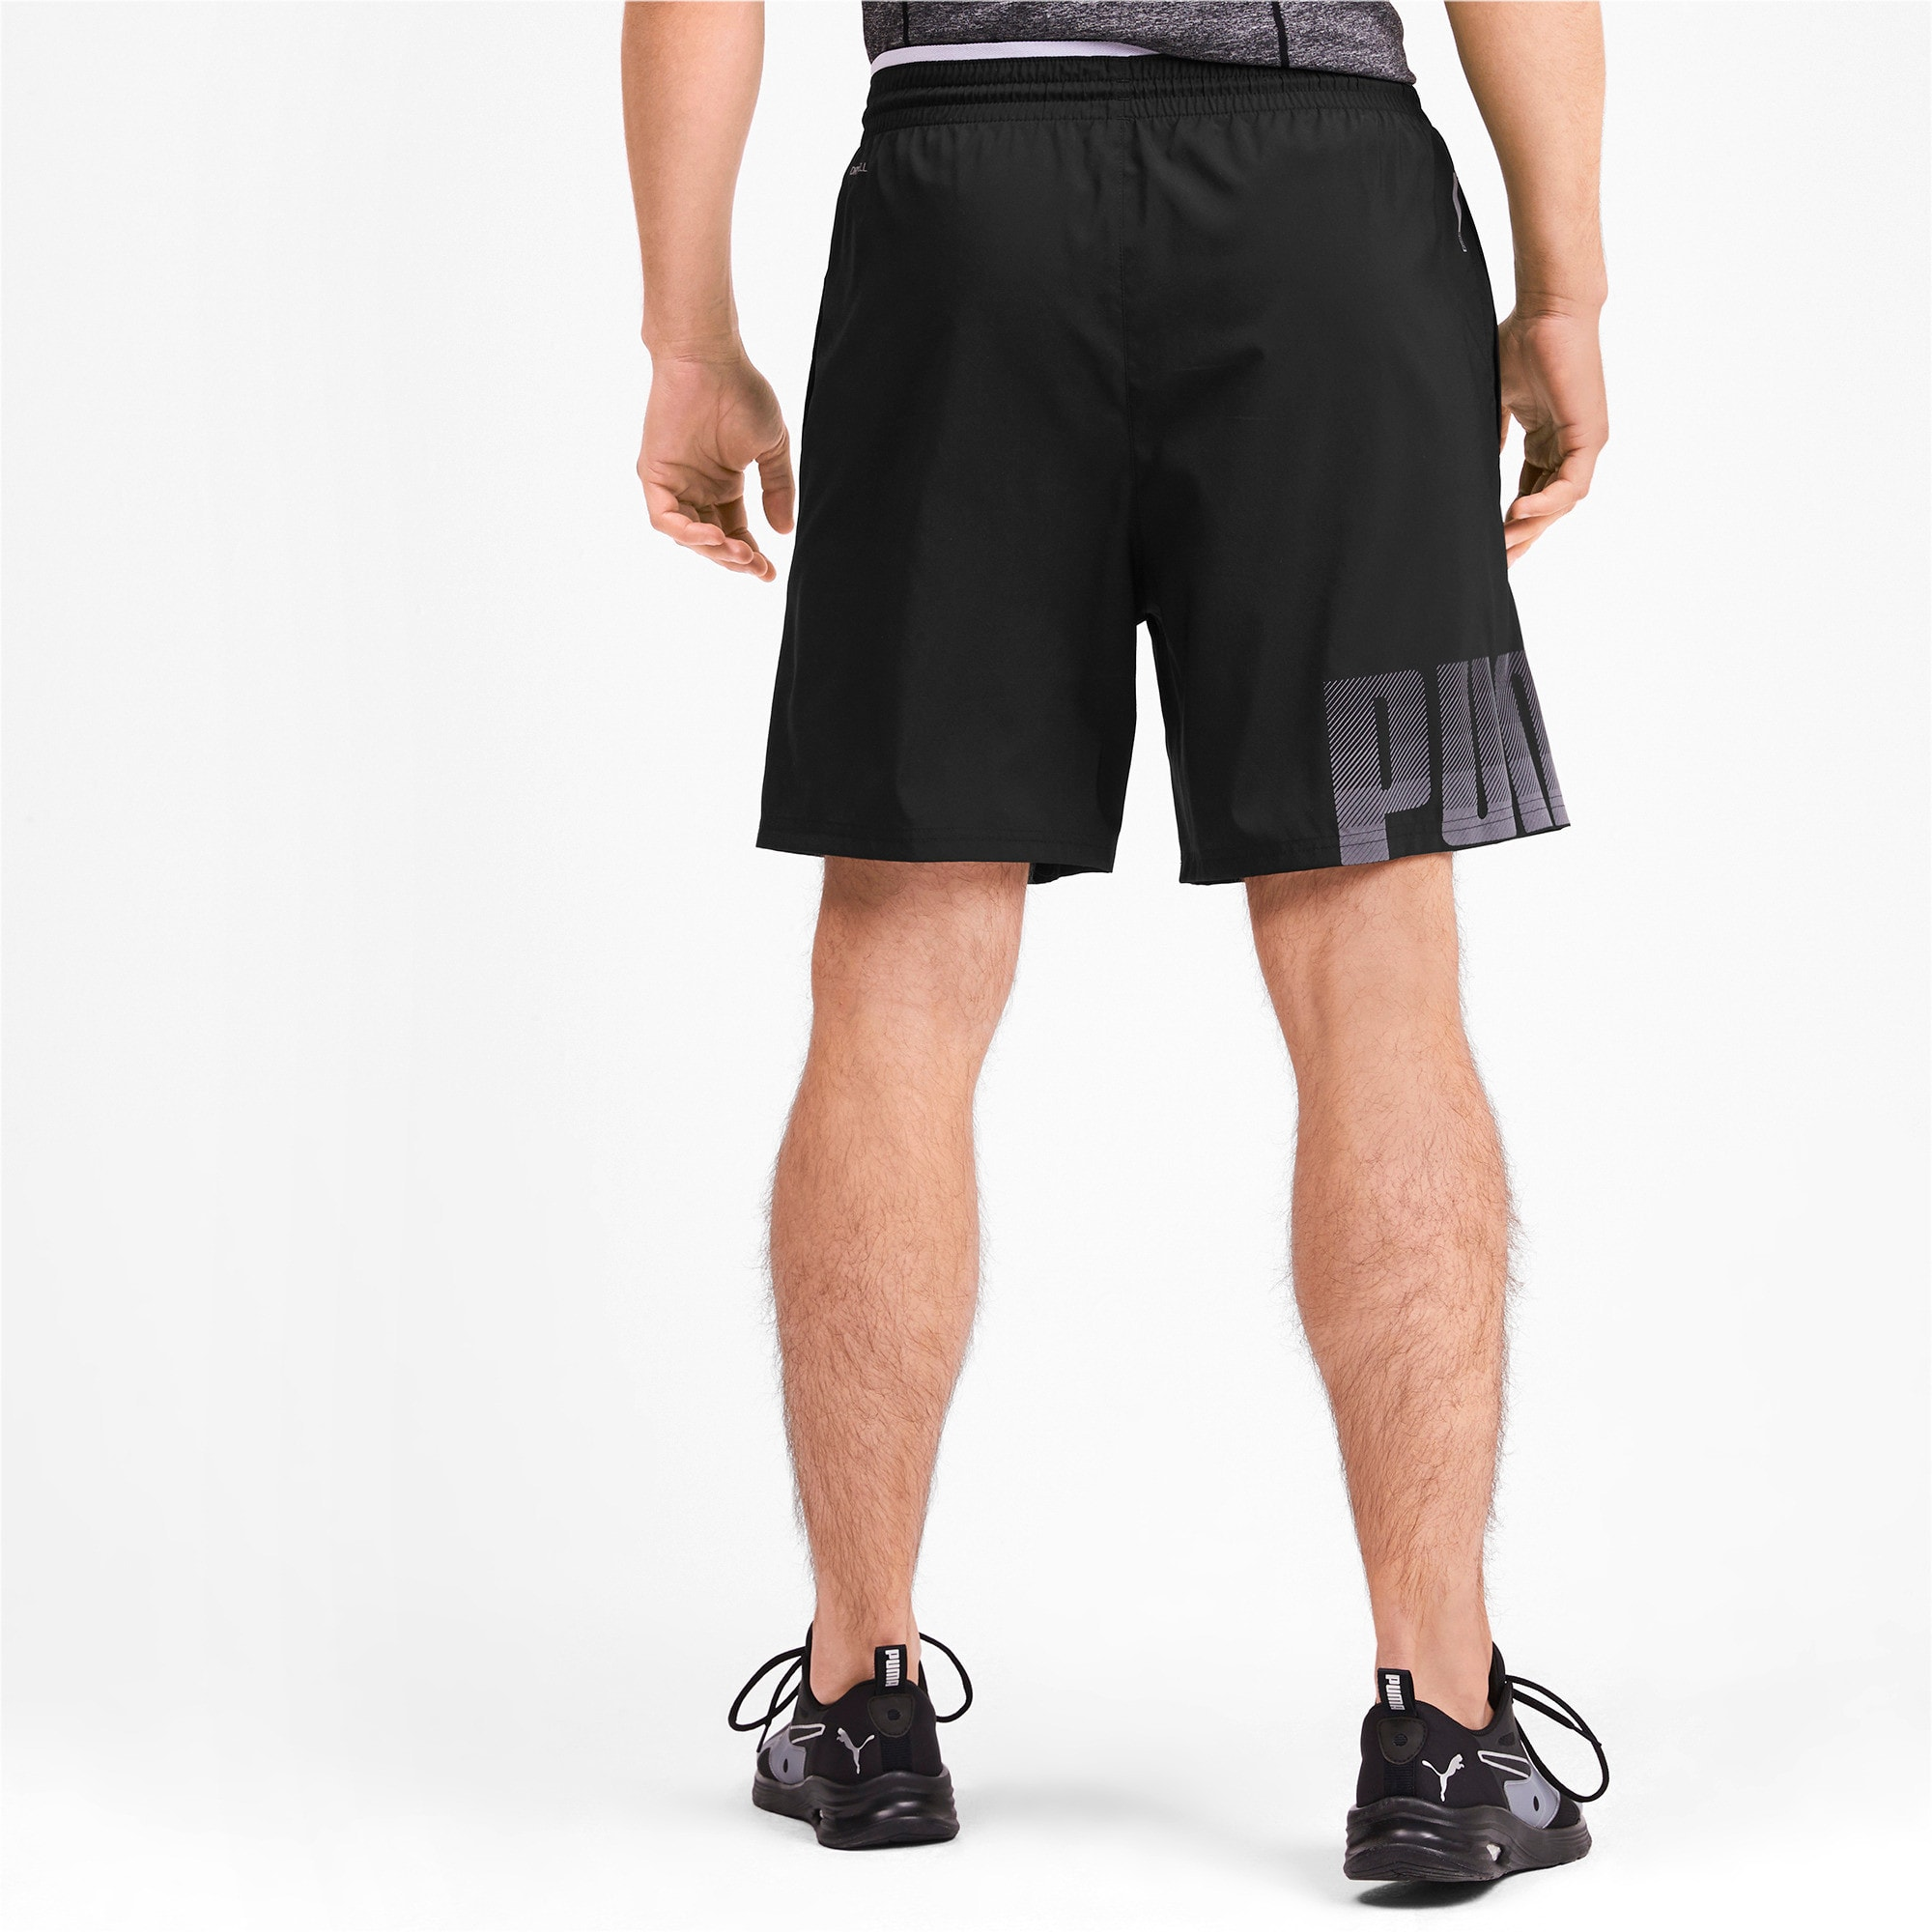 Thumbnail 2 of Collective Woven Men's Training Shorts, Puma Black, medium-IND